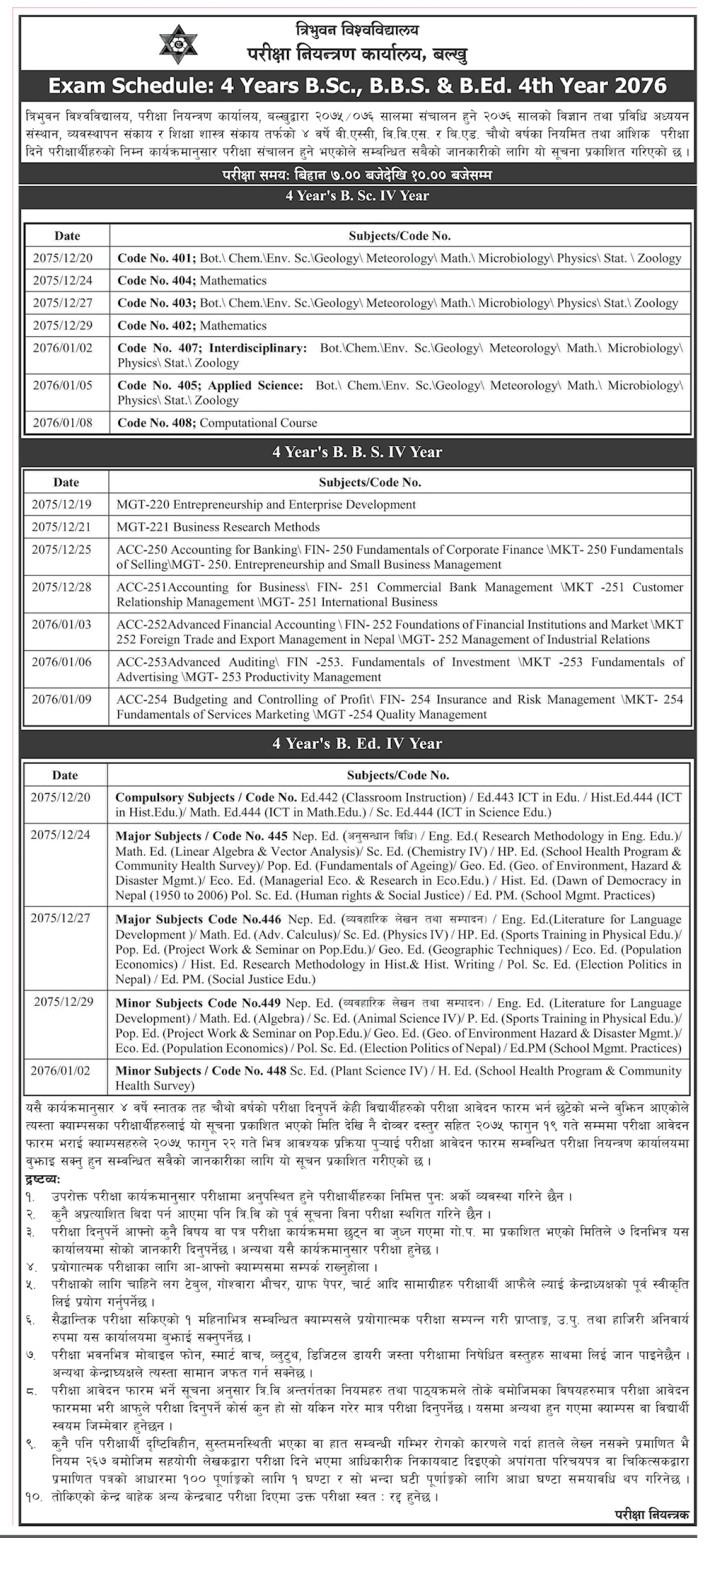 Tribhuvan University Exam Schedule Tribhuvan University Exam Routing Tribhuvan University Exam Schedule 4 Years  B.Ed.,  Tribhuvan University Exam Routing 4 Years  B.Ed.,  Tribhuvan University Exam Schedule 4 Years  B.B.S, Tribhuvan University Exam Routing 4 Years  B.B.S, Tribhuvan University Exam Schedule  4 Years B.Sc.,  Tribhuvan University Exam Routing  4 Years B.Sc.,   4 Years B.Sc.,  4 Years  B.B.S, 4 Years  B.Ed.,  Exam Routing 4 Years B.Sc.,  Exam Routing  4 Years  B.B.S, Exam Routing  4 Years  B.Ed.,  Exam Schedule  4 Years B.Sc.,  Exam Schedule  4 Years  B.B.S, Exam Schedule  4 Years  B.Ed.,